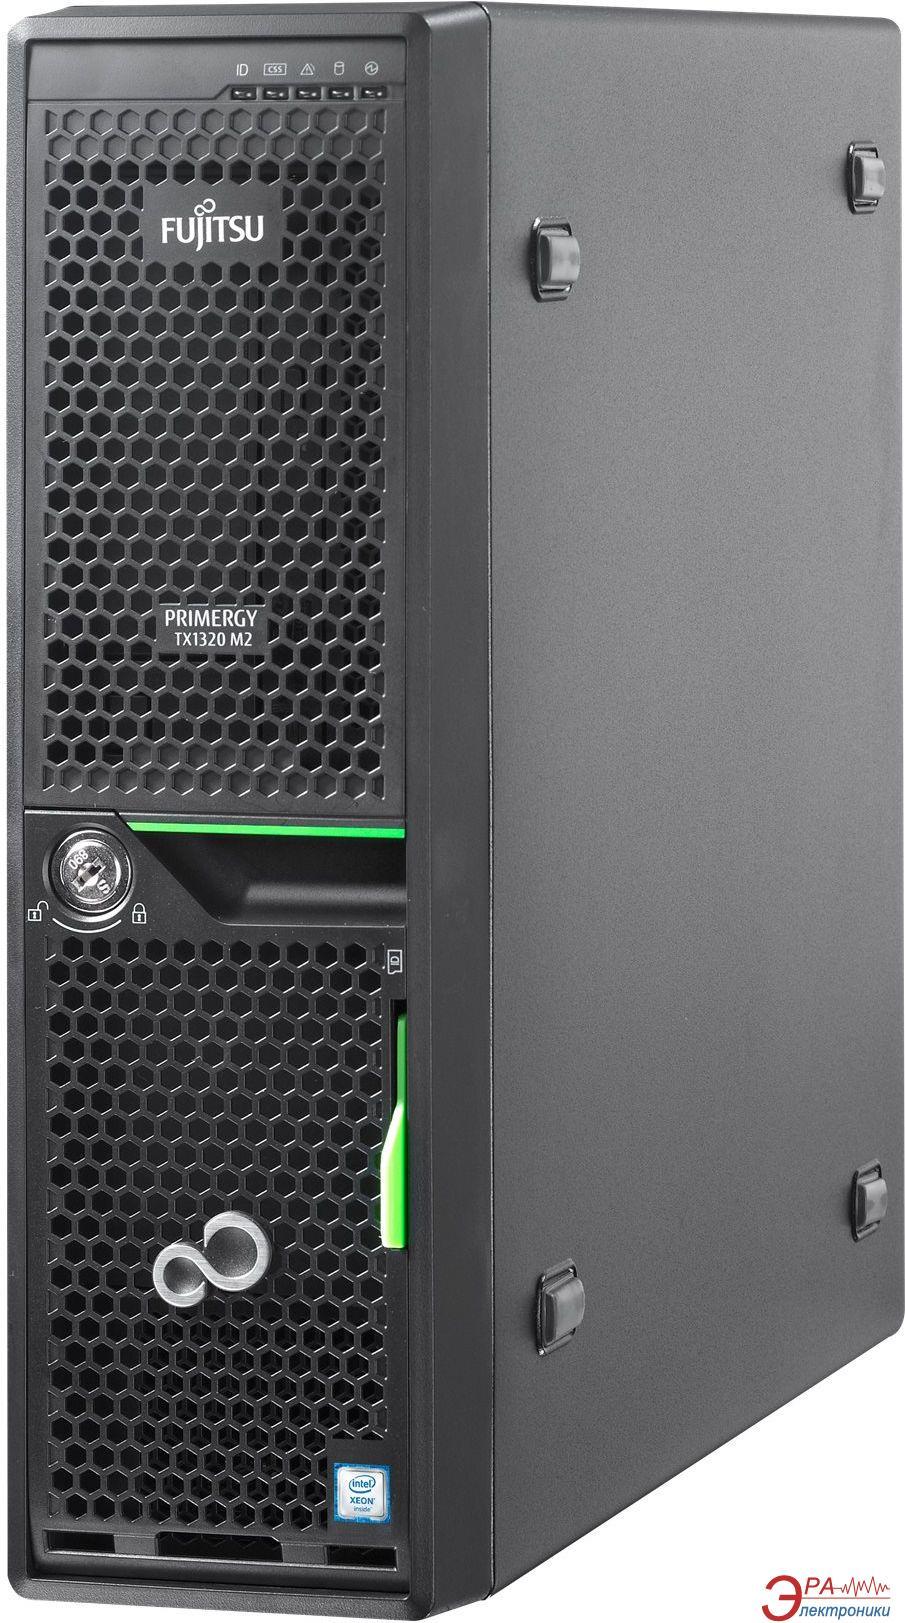 Сервер FUJITSU PY TX1320 M2 (VFY:T1322SC020IN)